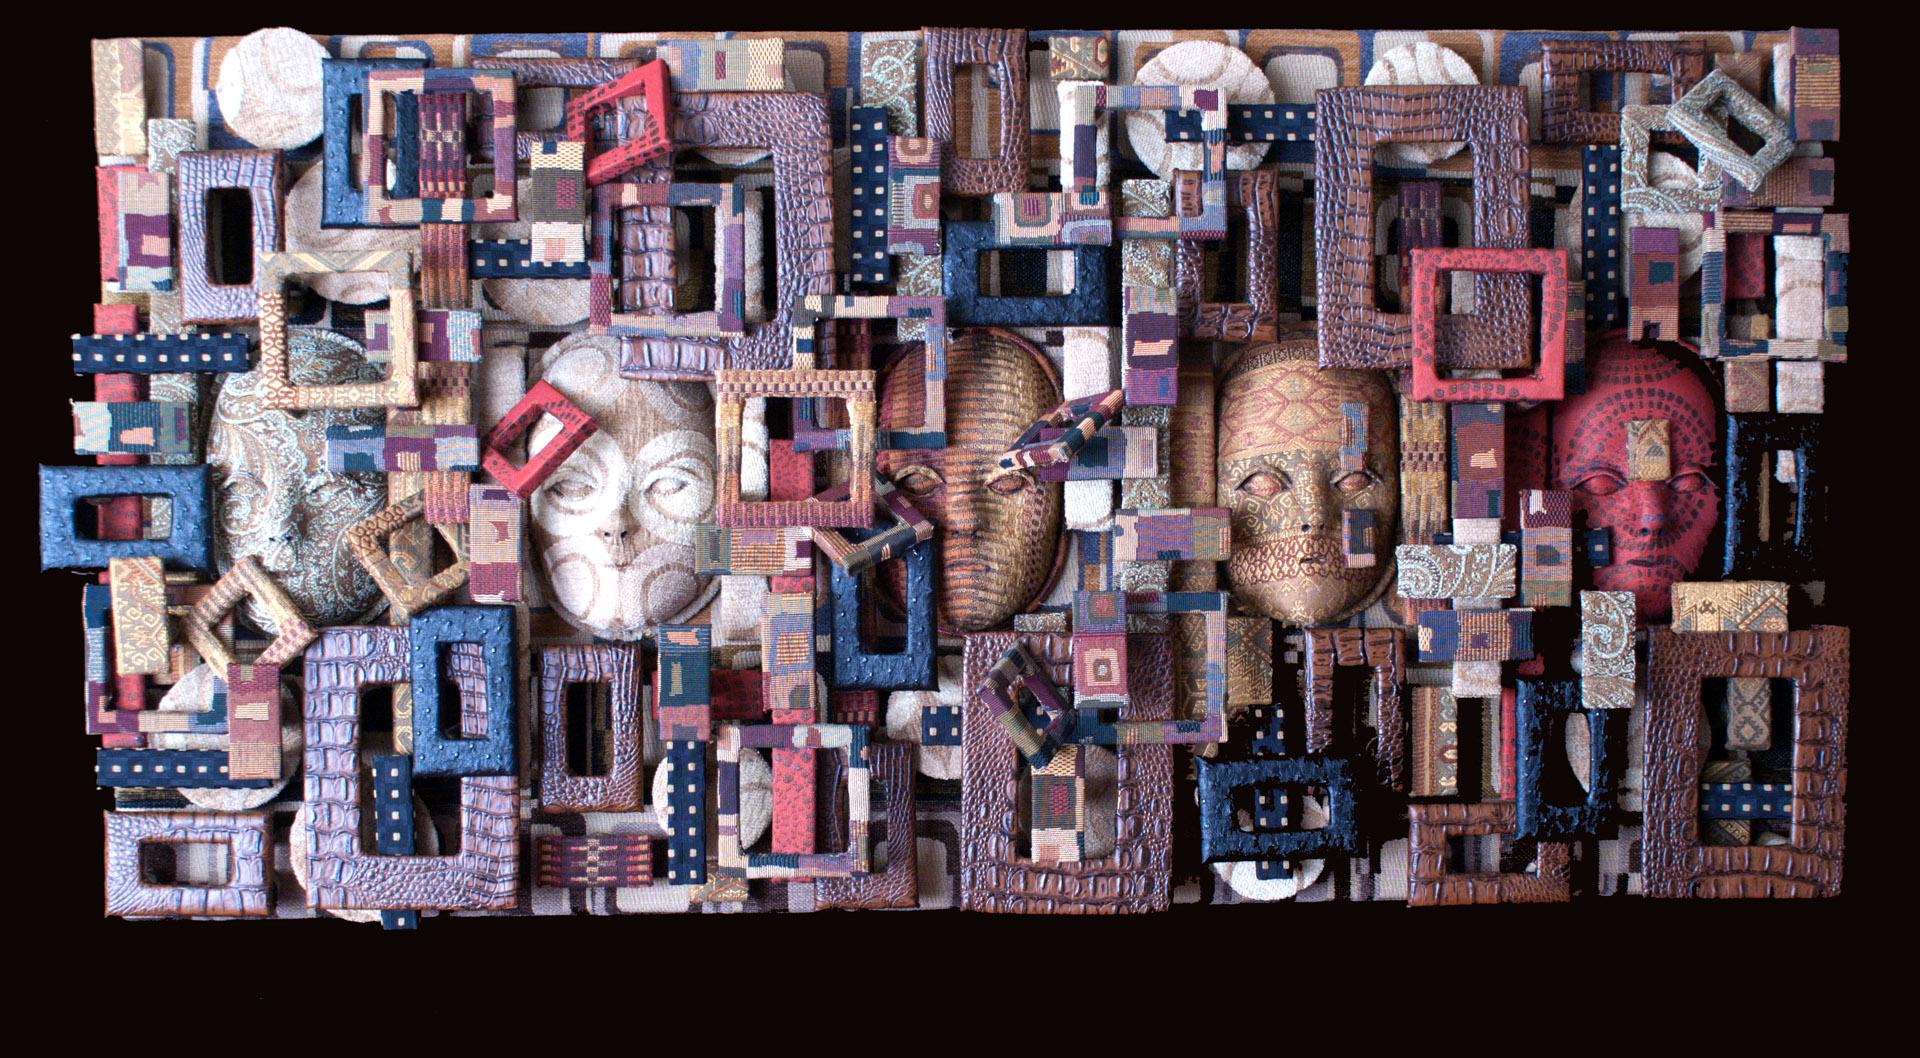 wall art sculpture, mixed media & fabric art, textile art, visual art